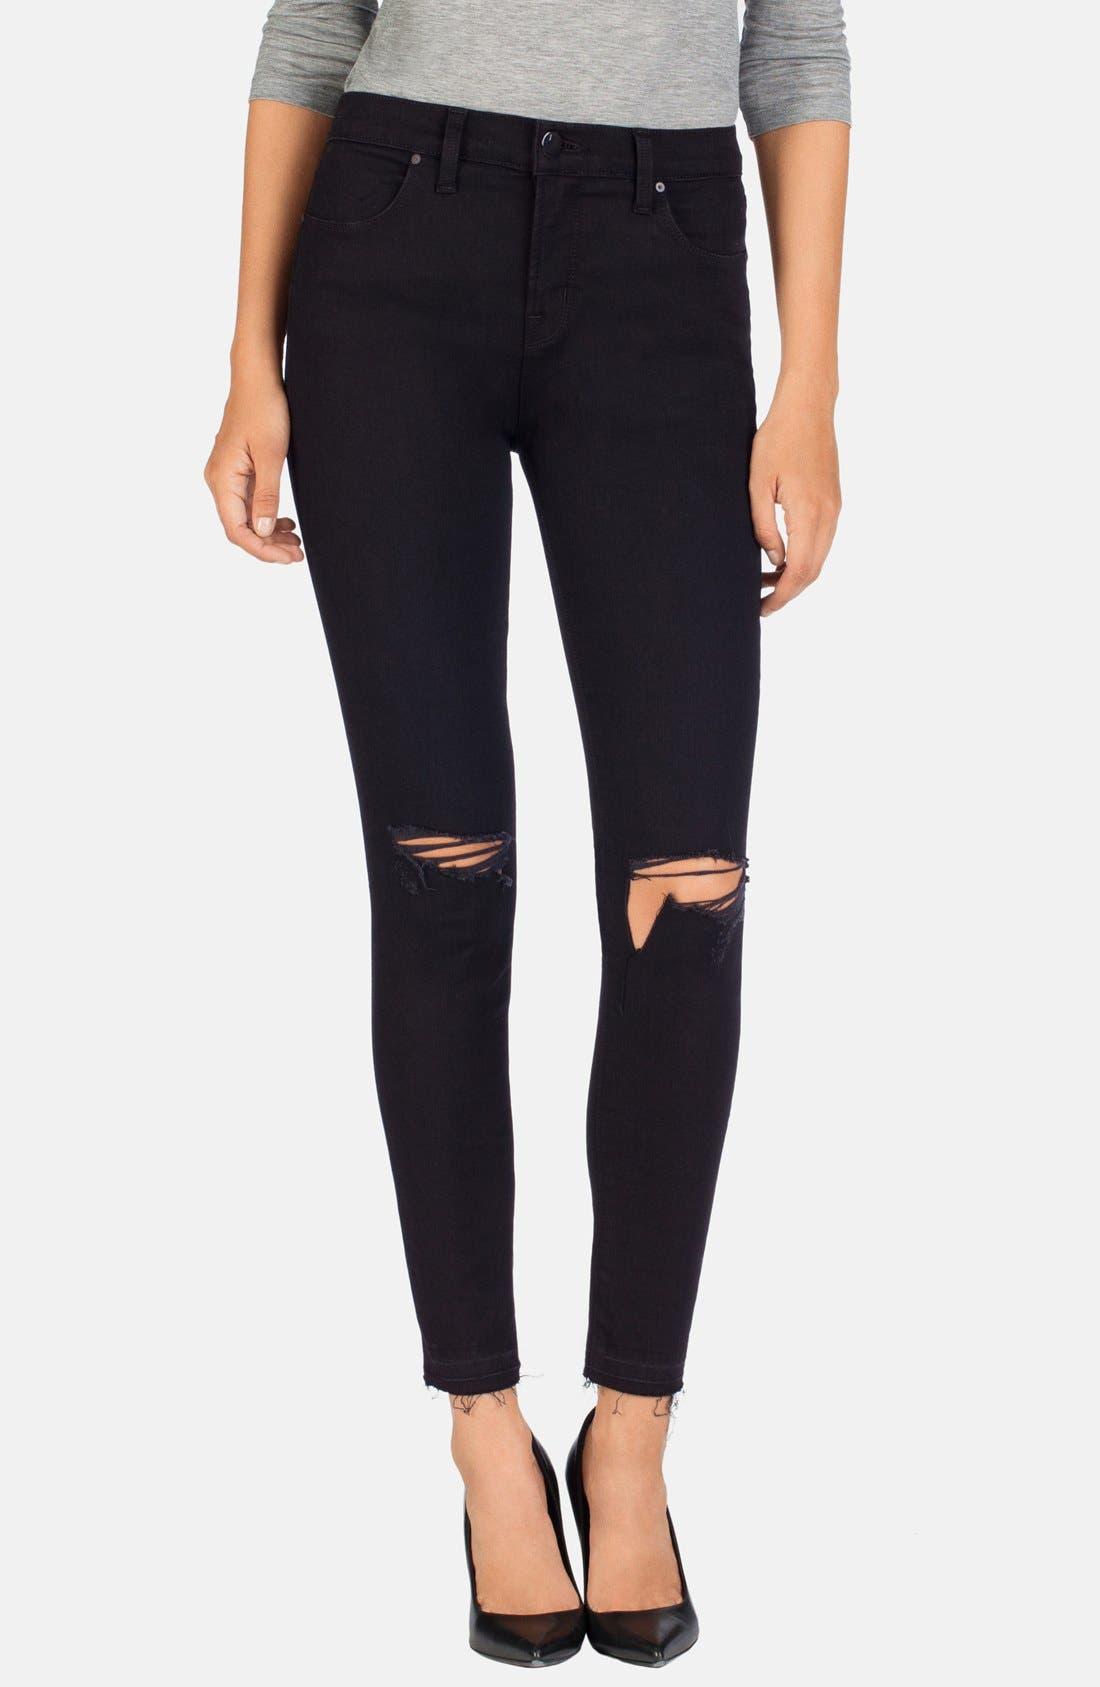 Alternate Image 1 Selected - J Brand 'Alana' High Rise Crop Jeans (Offbeat)